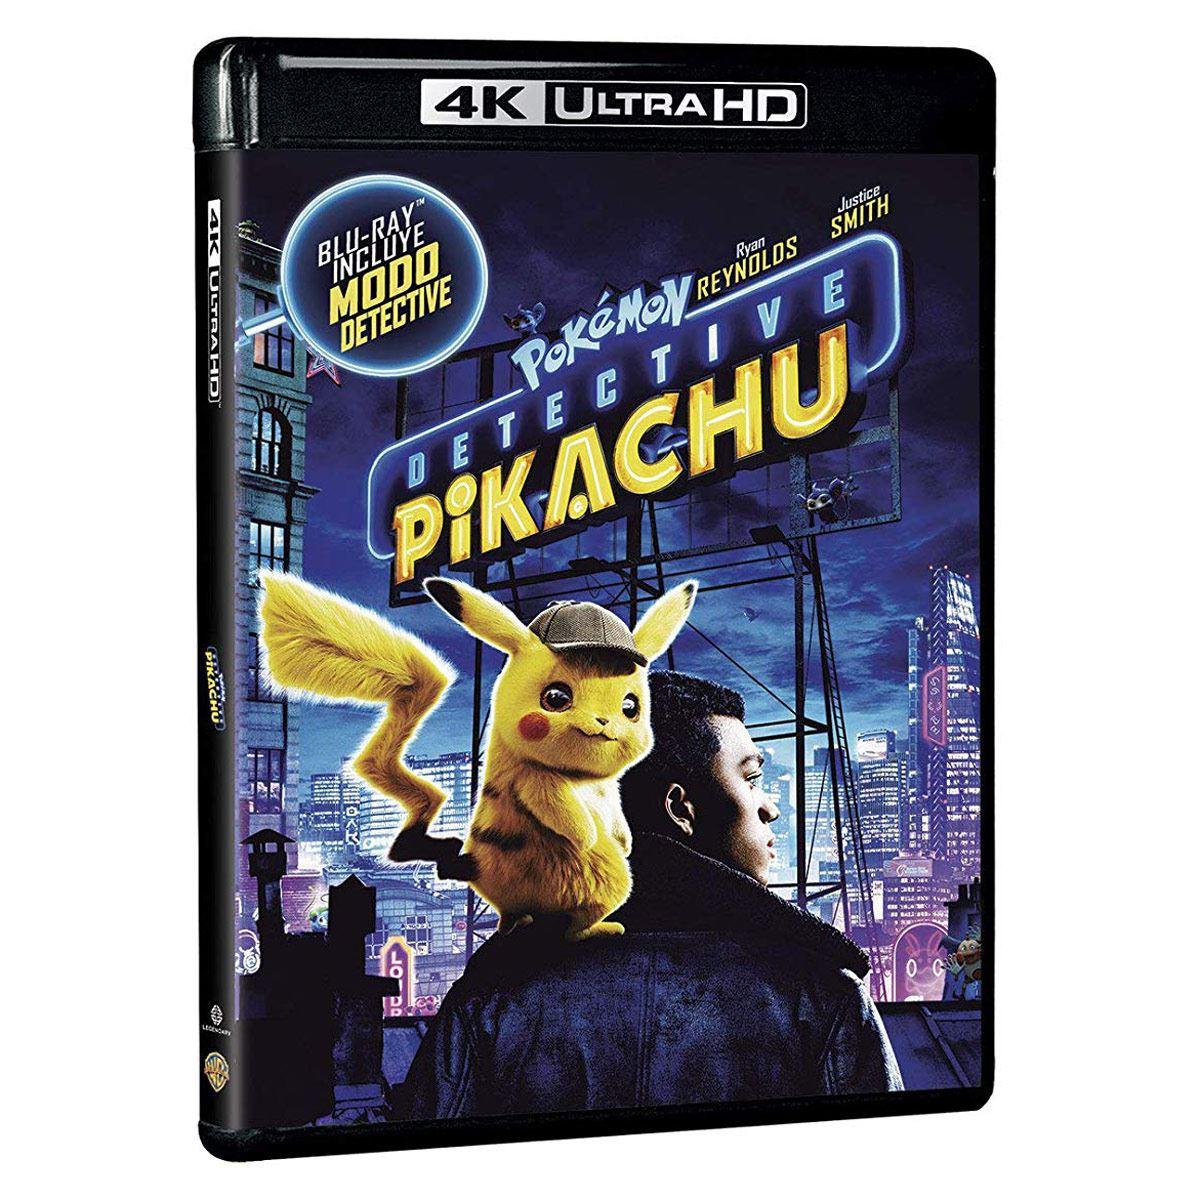 4K UHD Pokémon Detective Pikachu